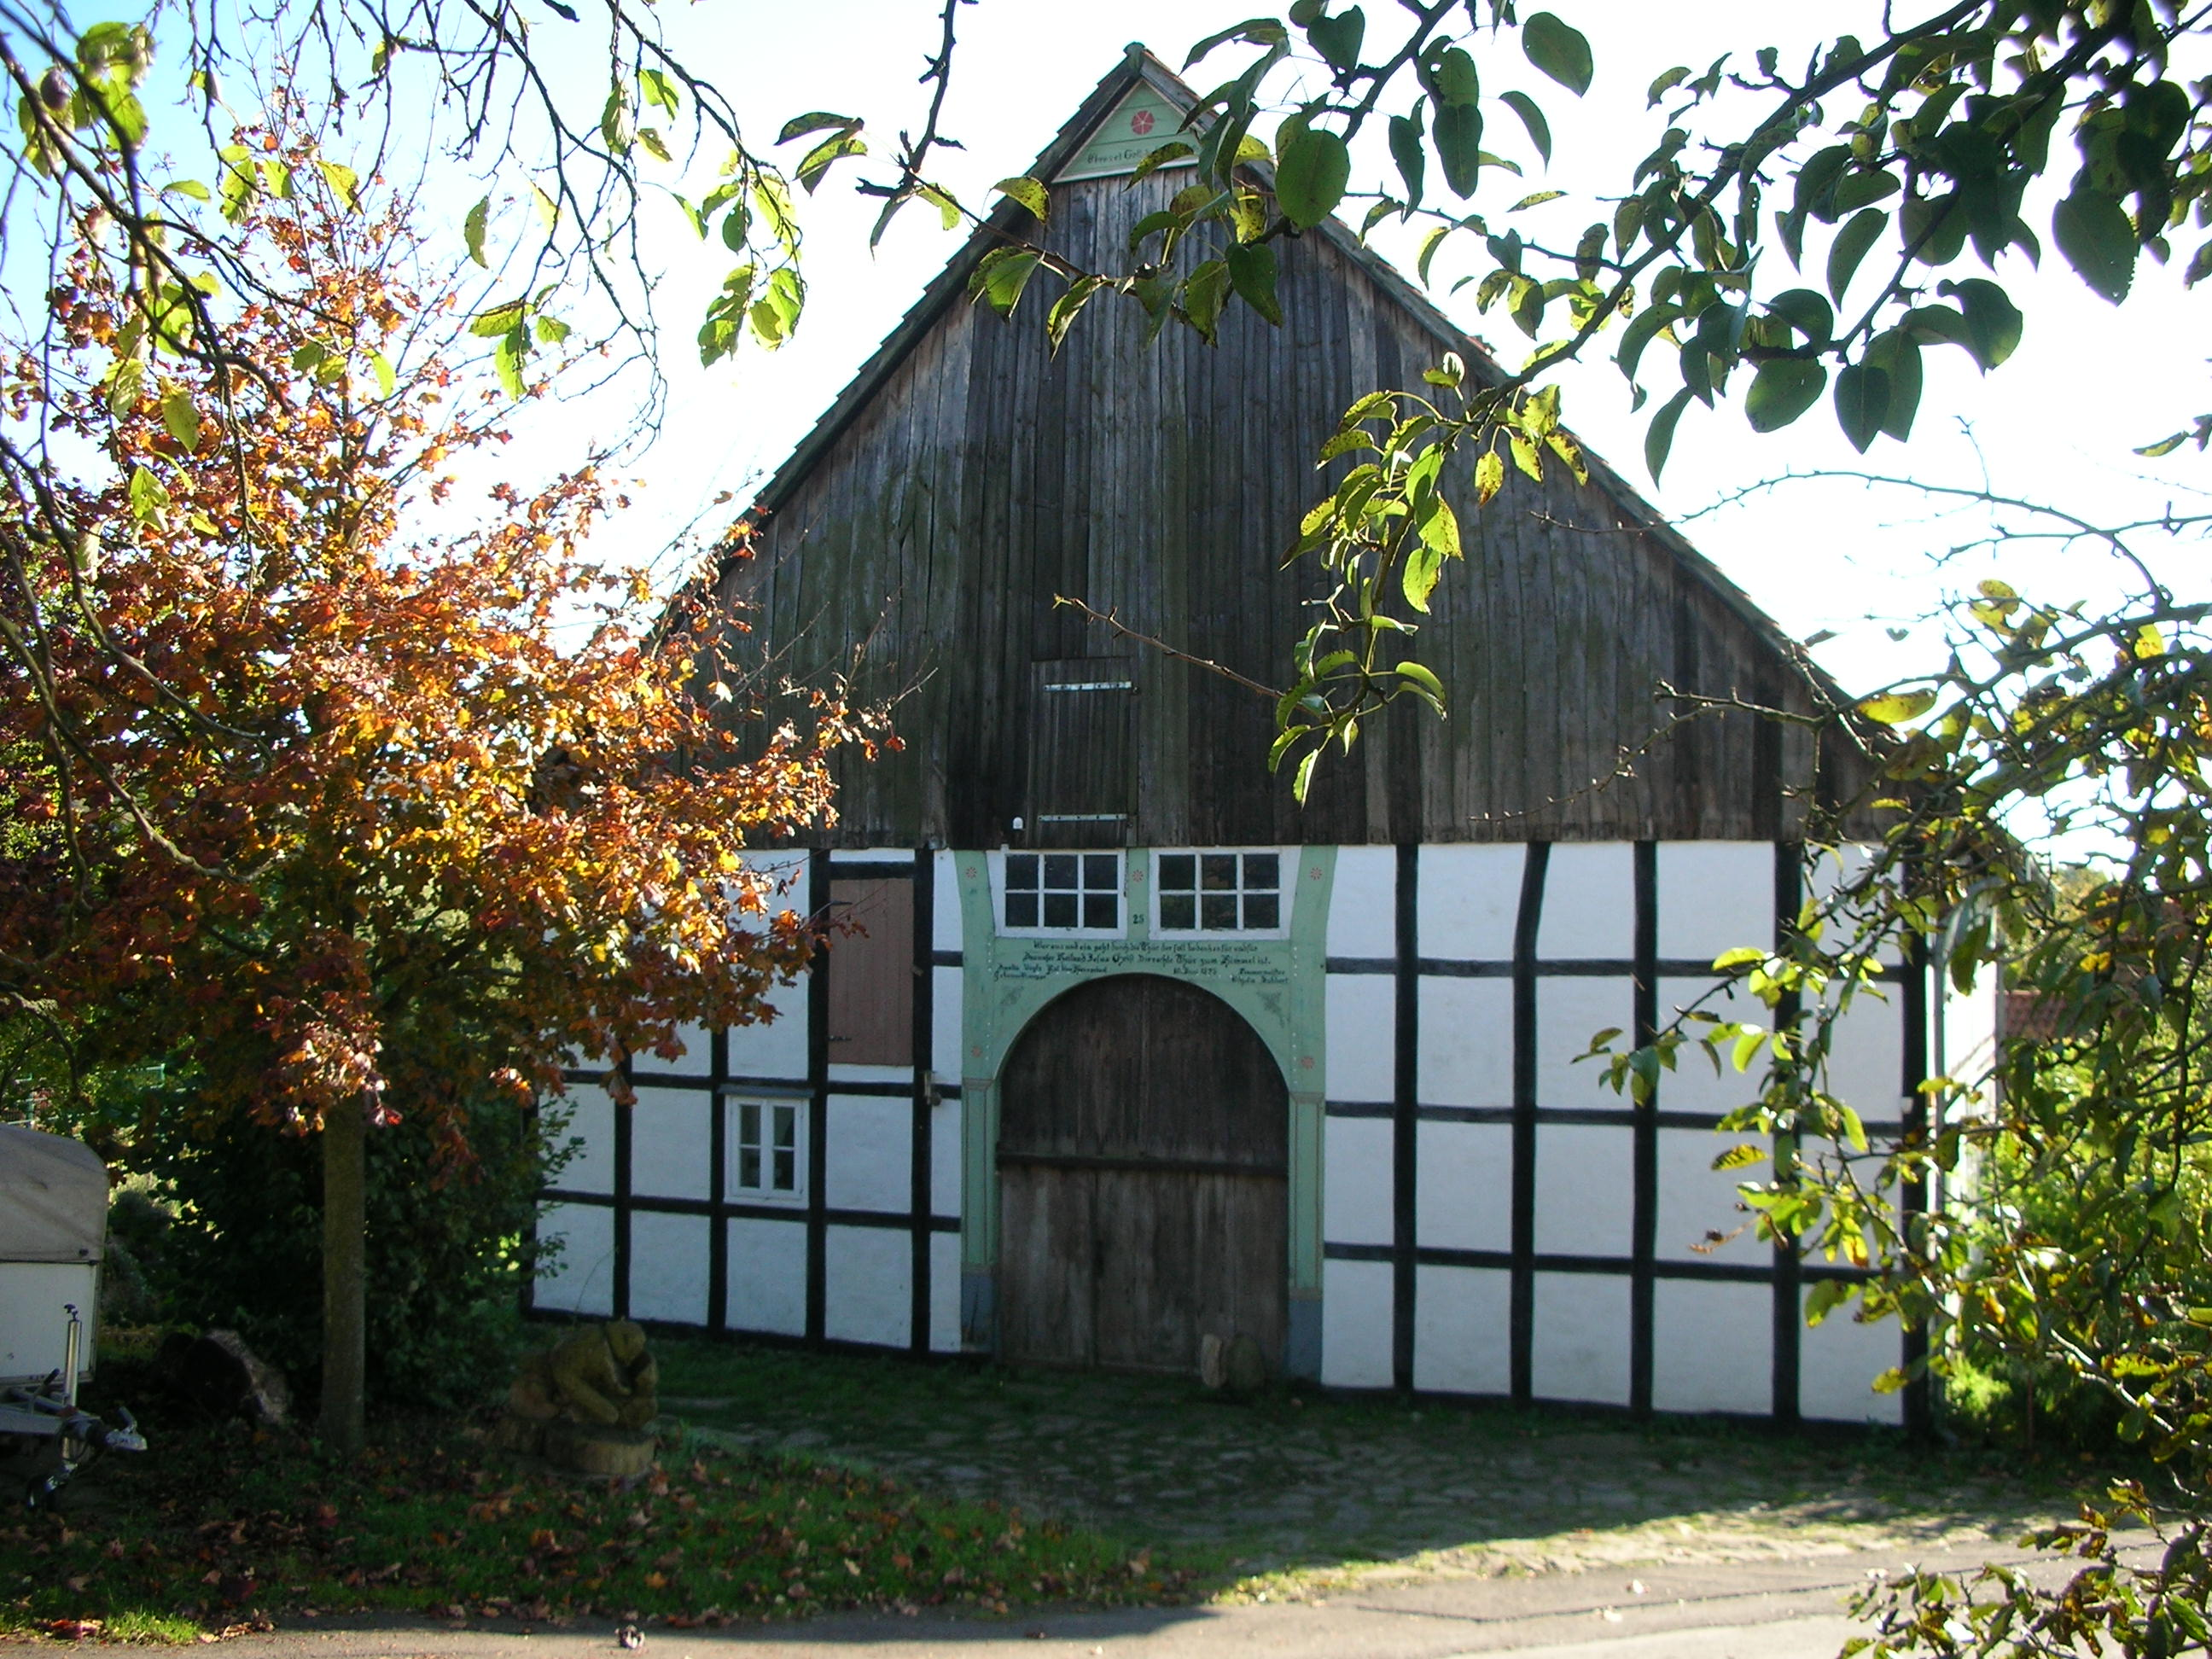 File:Fachwerkhaus in Alt-Schwelentrup.JPG - Wikimedia Commons